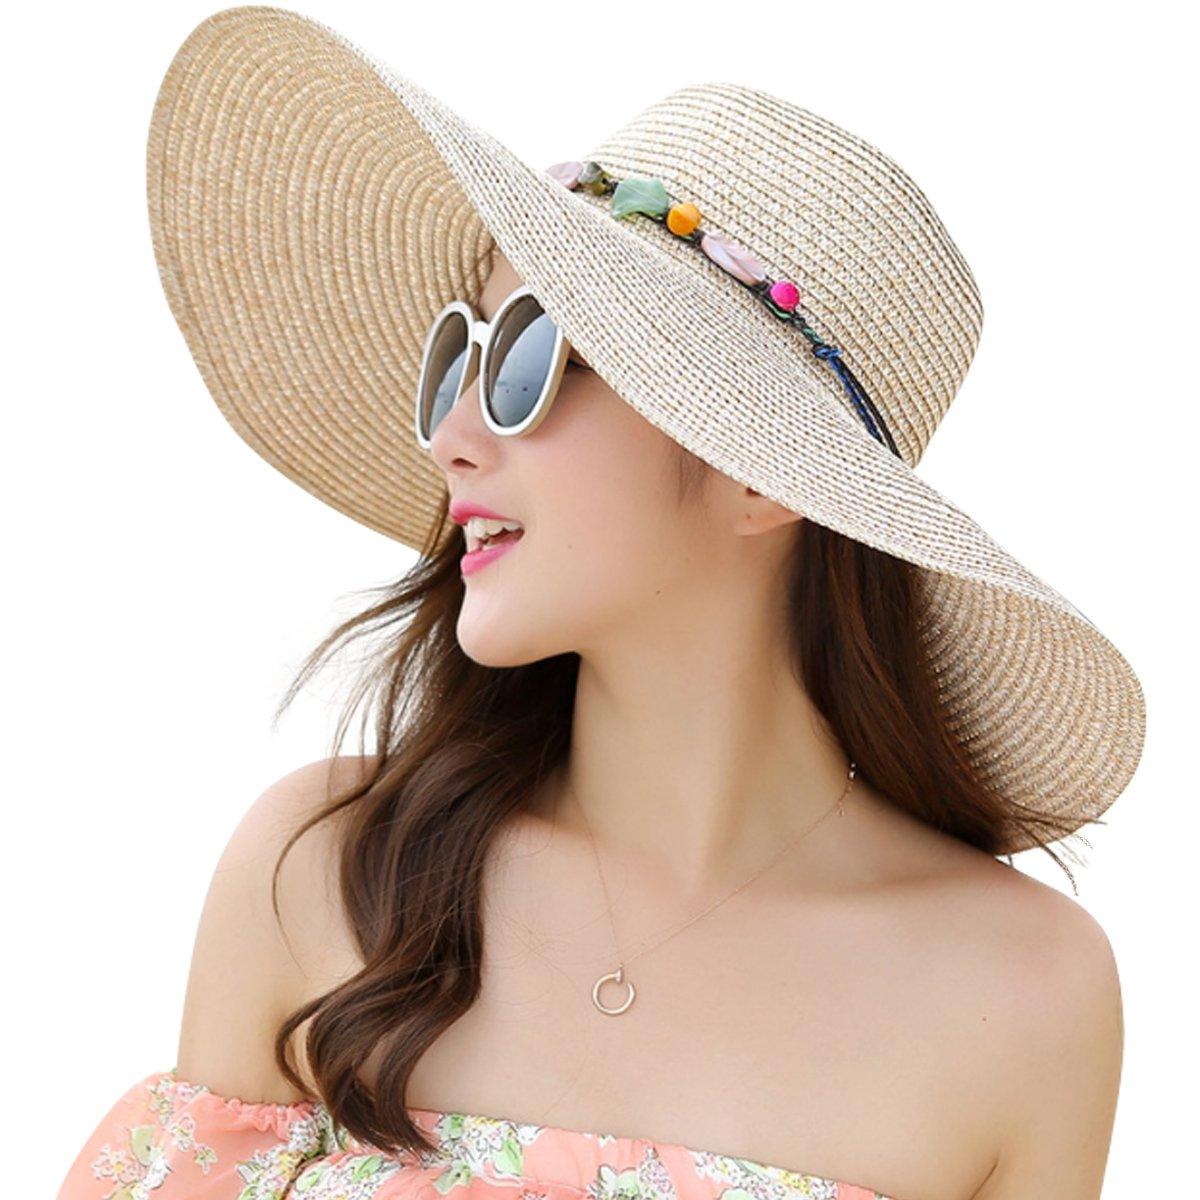 JOYEBUY Women's Floppy Big Brim Hat Bowknot Straw Hat Foldable Roll up Sun Hat (Style B-Khaki)